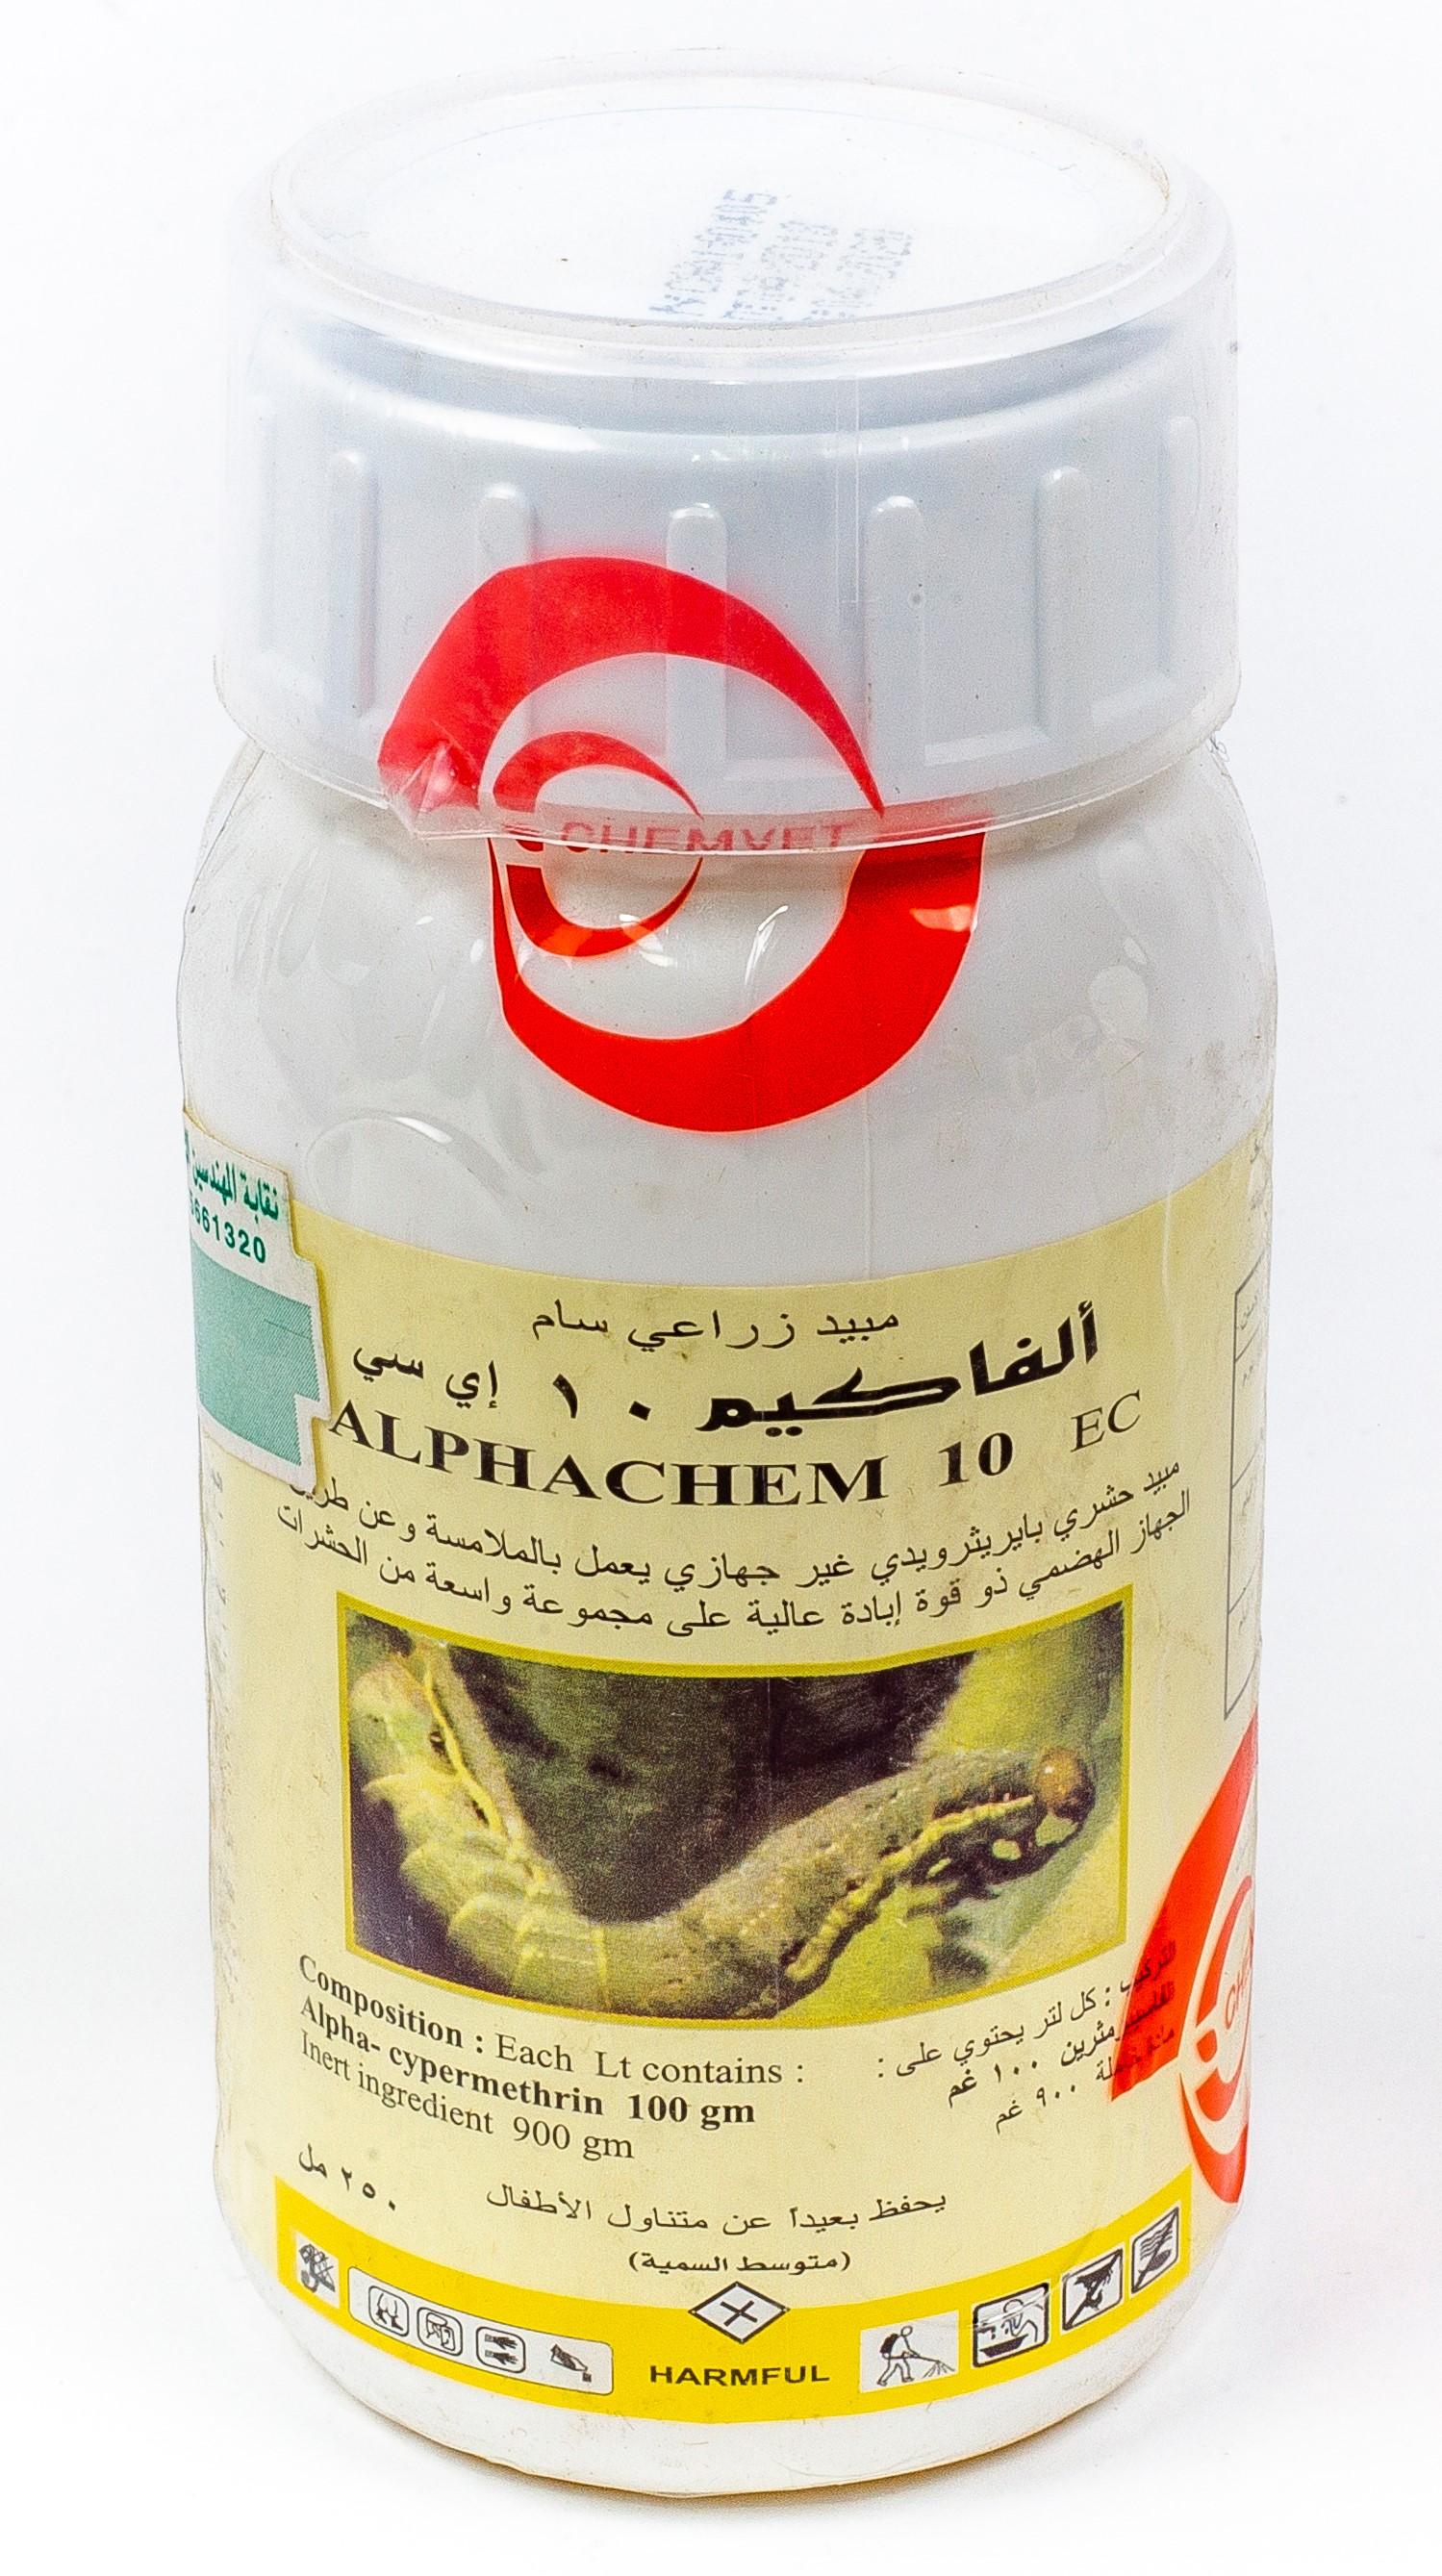 Alphachem 10 EC